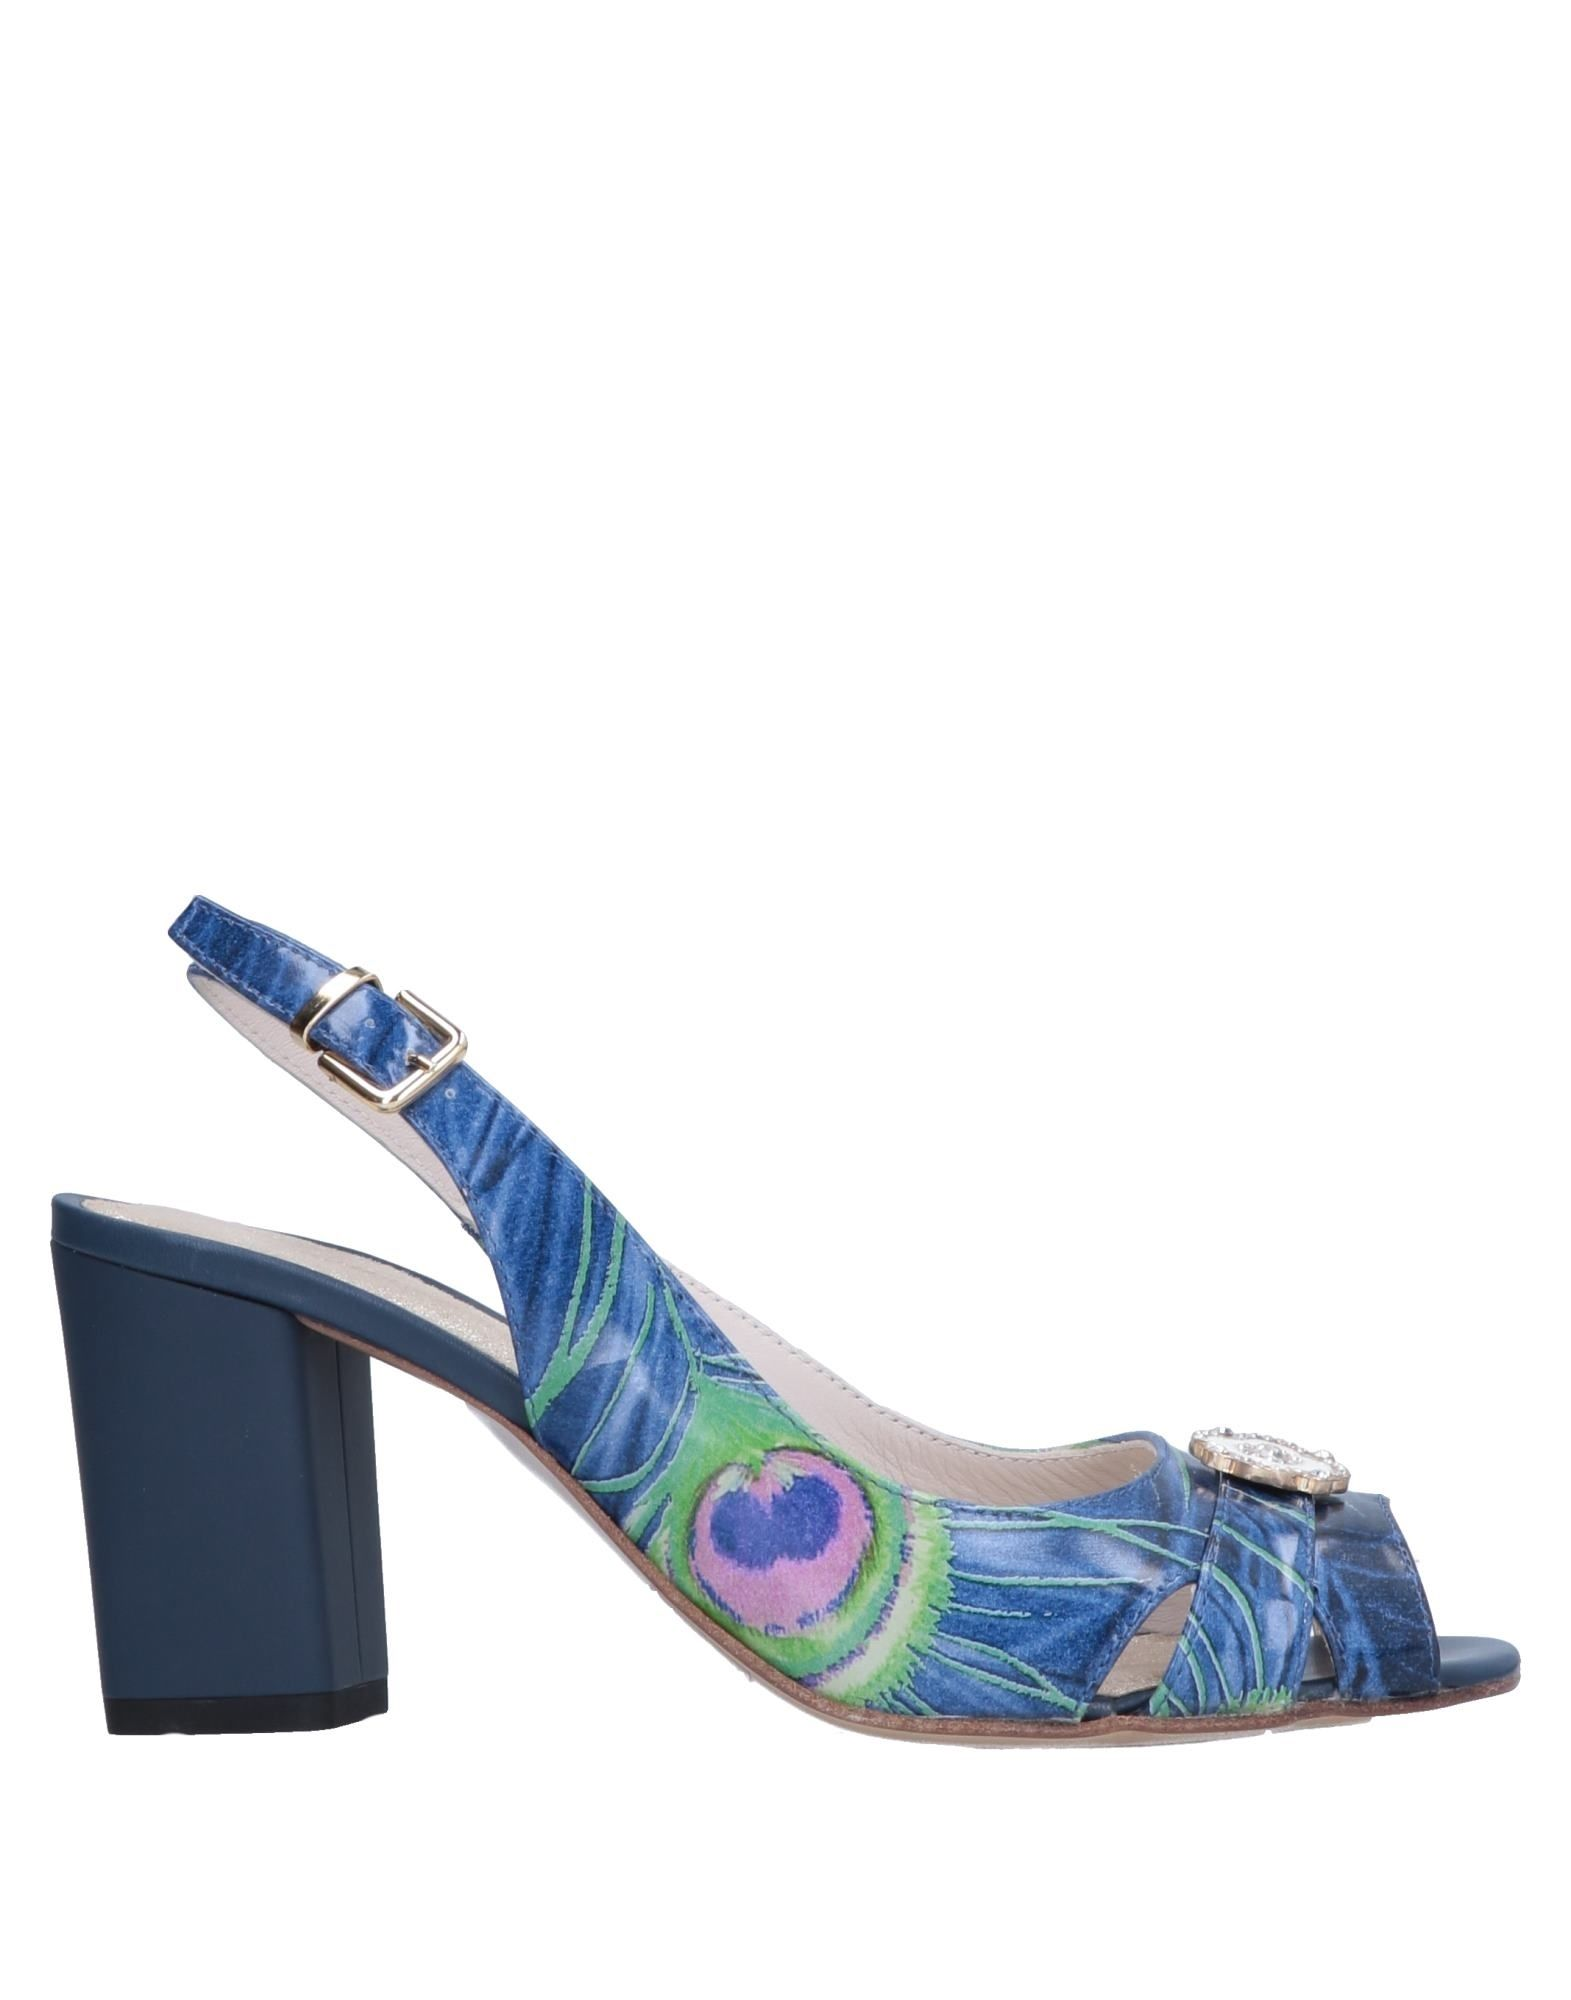 Loretta Pettinari Sandalen Damen  11550049WQ Gute Qualität beliebte Schuhe